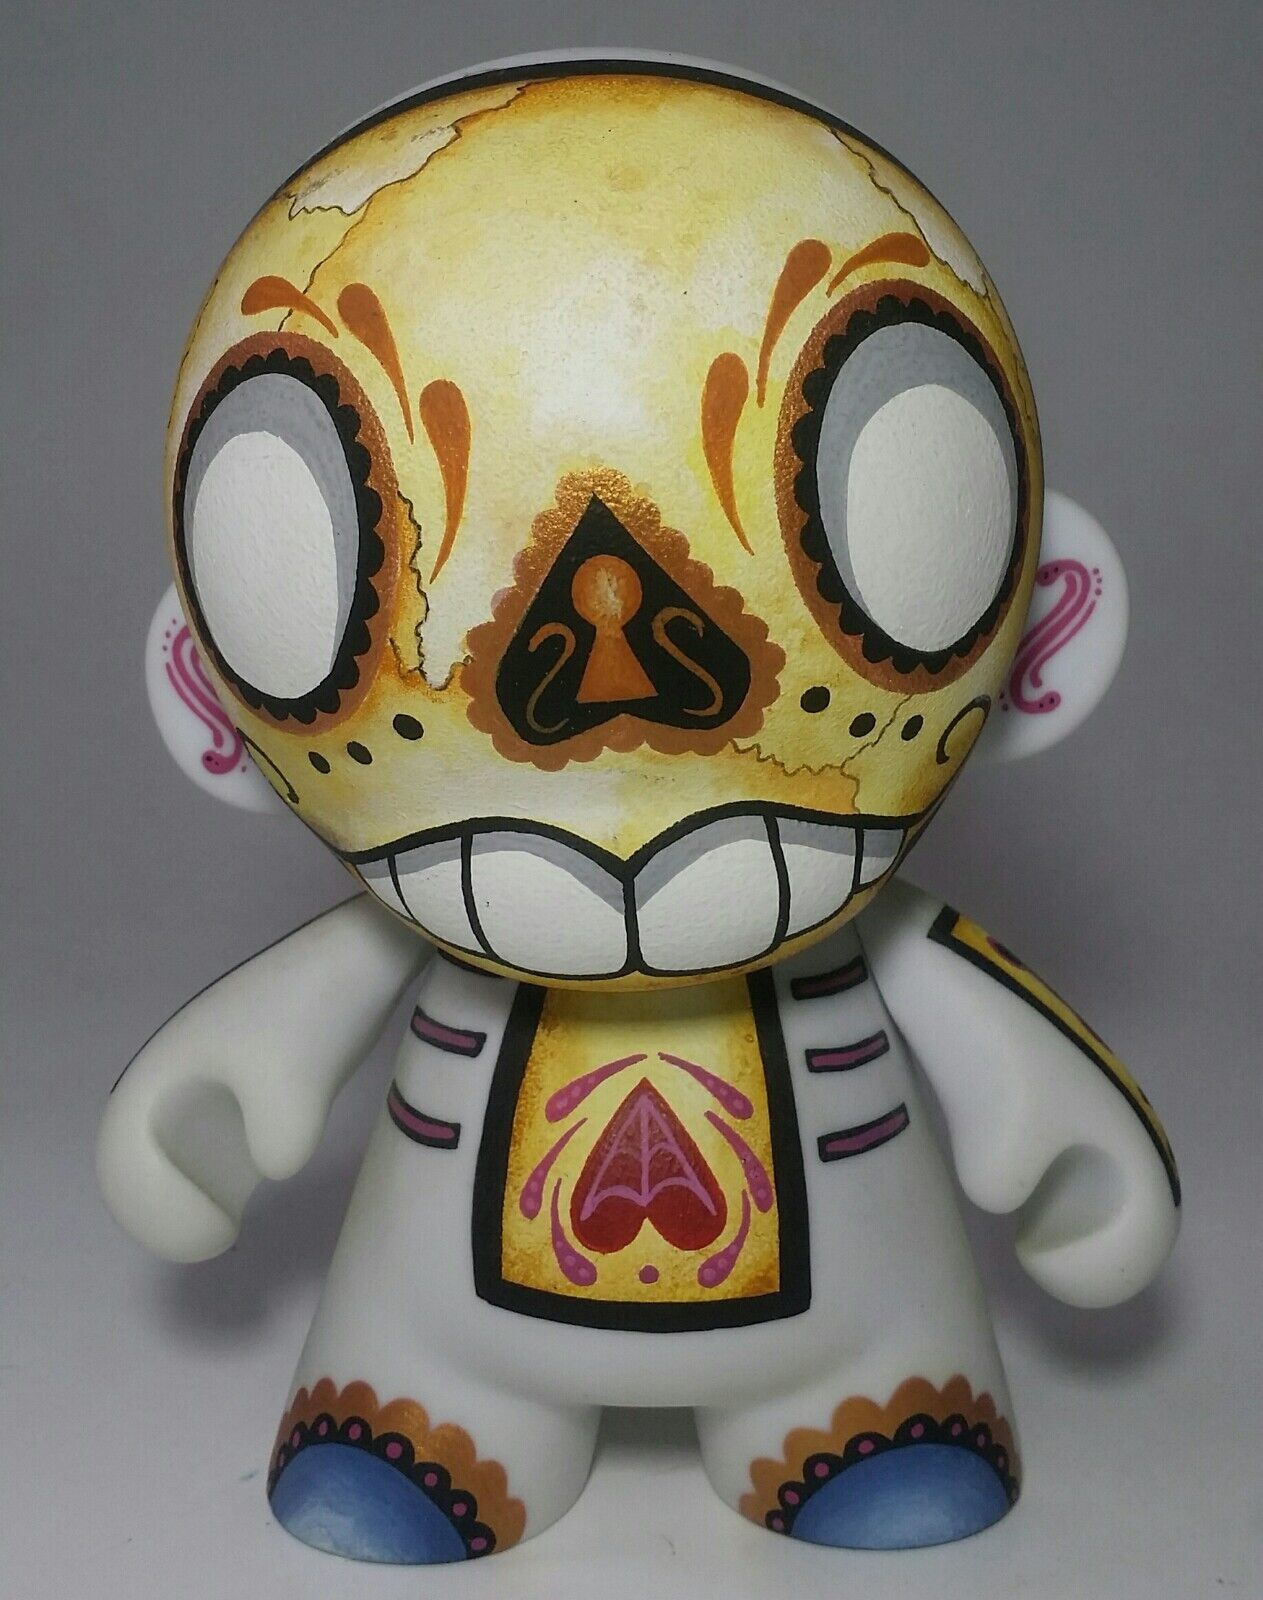 RSIN Art  Death  7  Munny Kidrobot